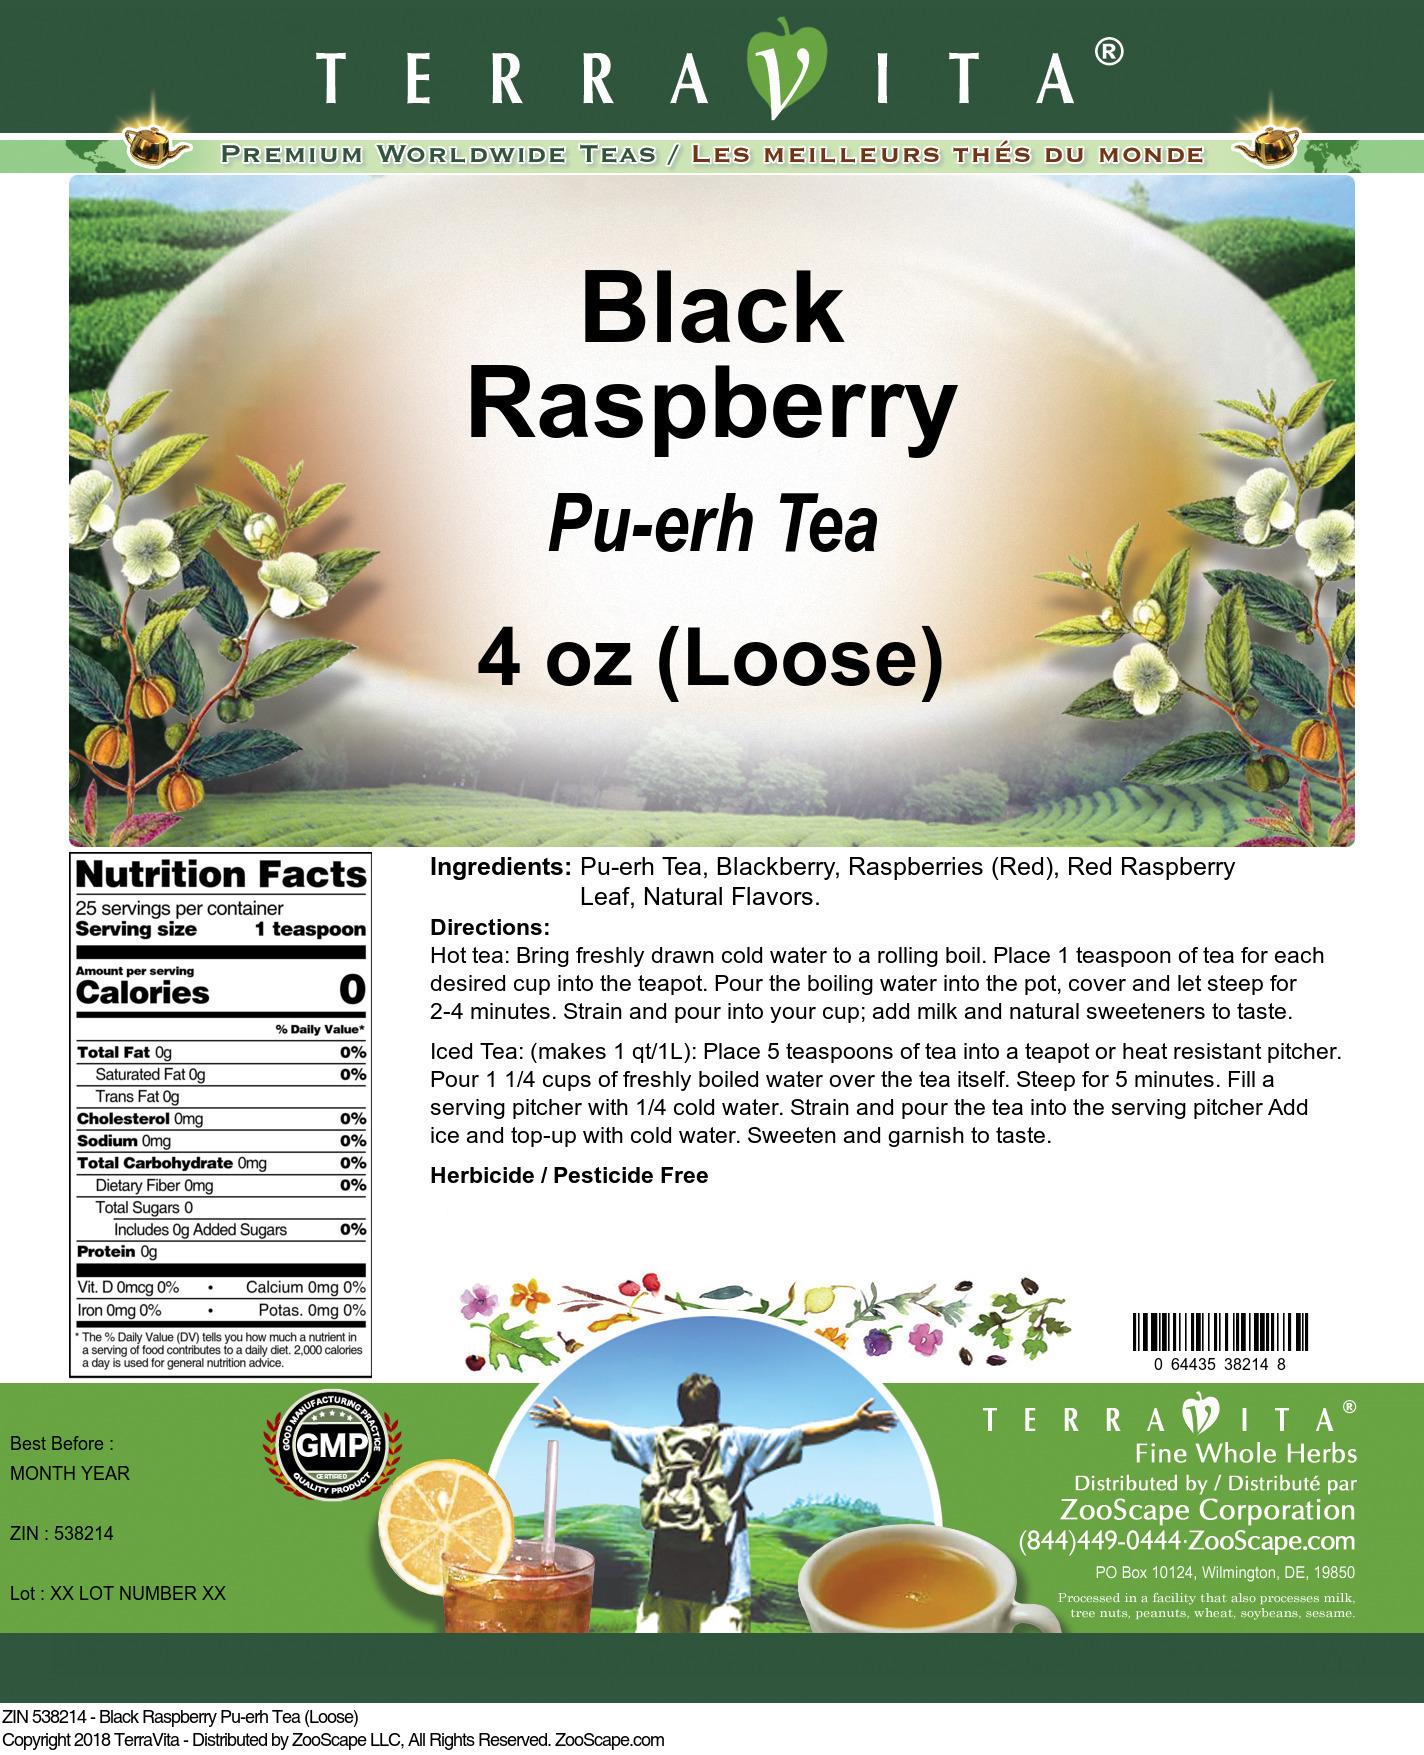 Black Raspberry Pu-erh Tea (Loose)